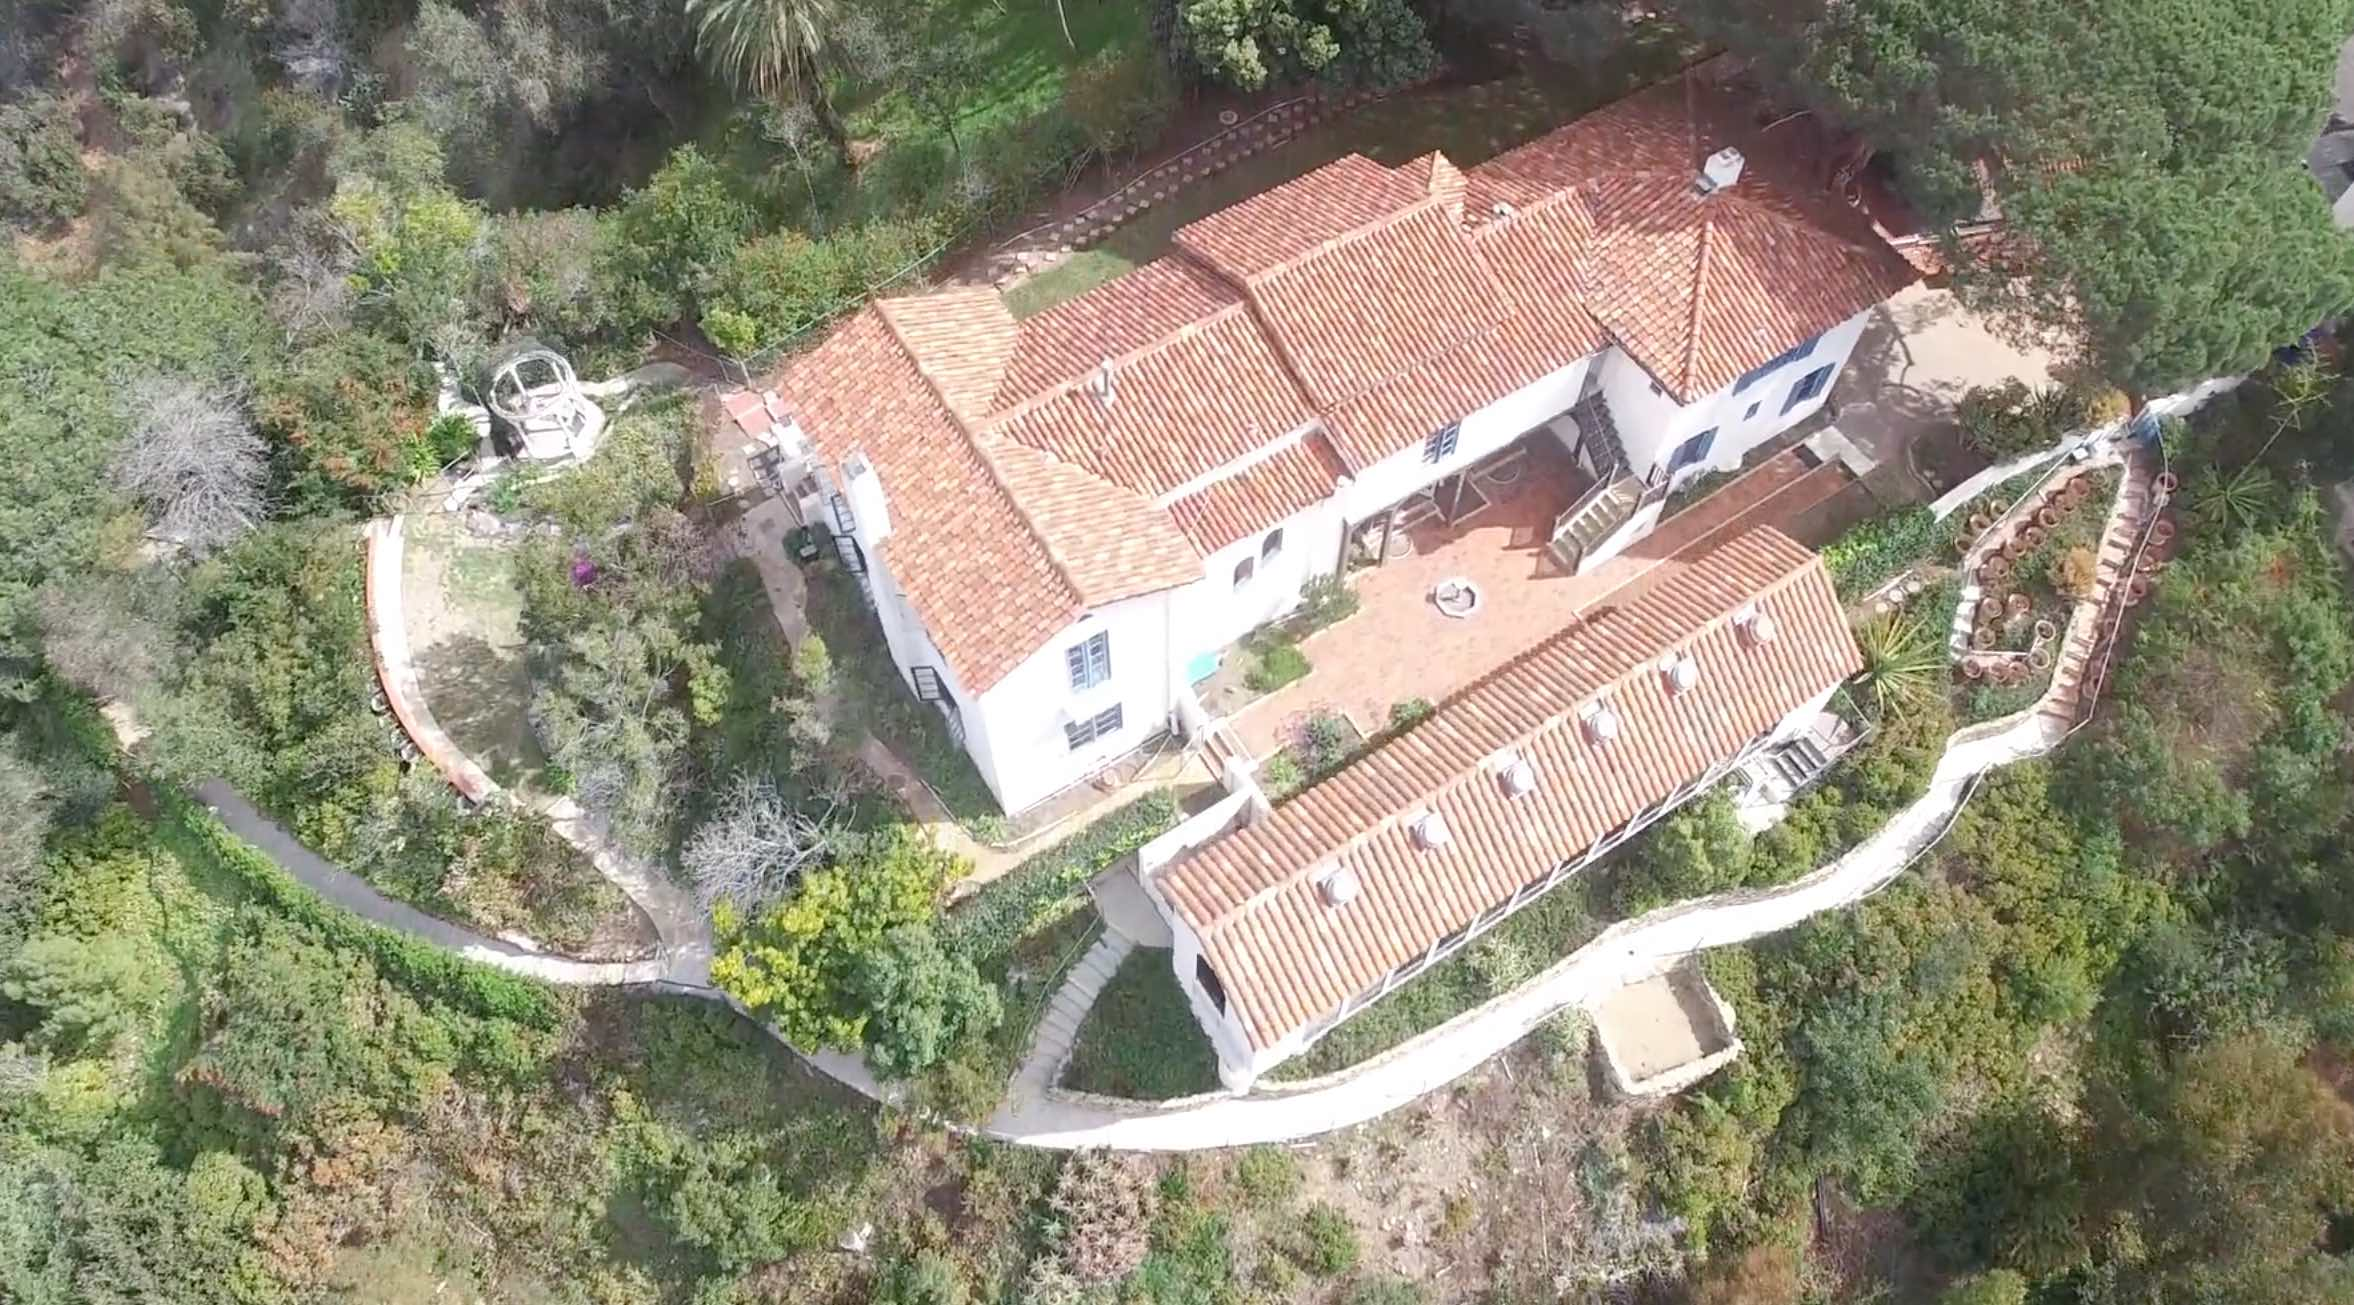 Villa-Hermosa-Aerial-11